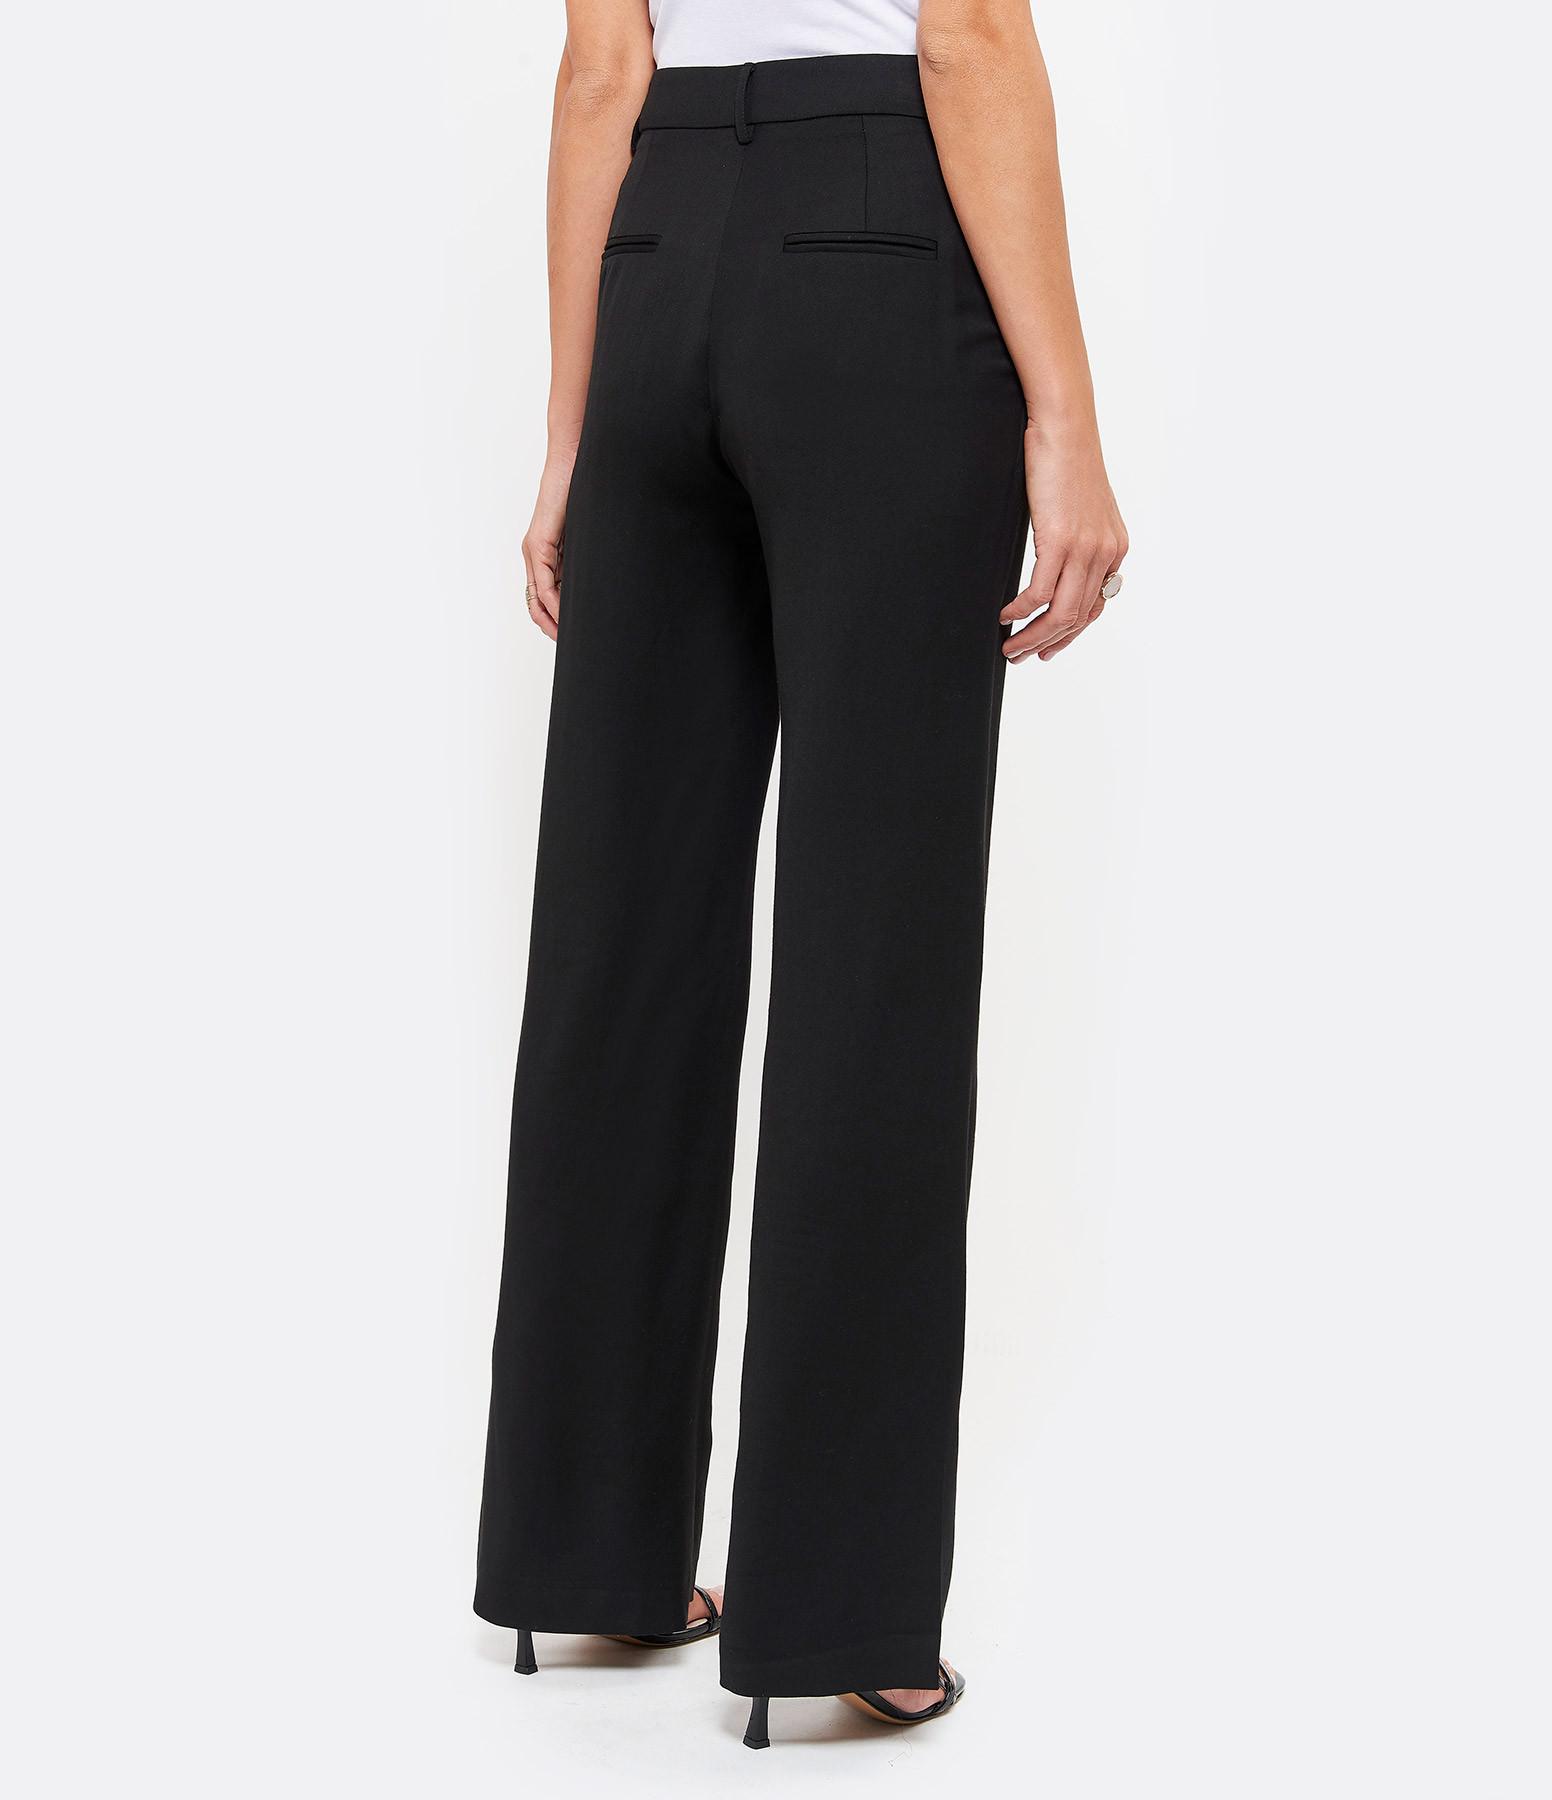 MARGAUX LONNBERG - Pantalon Sellers Laine Noir